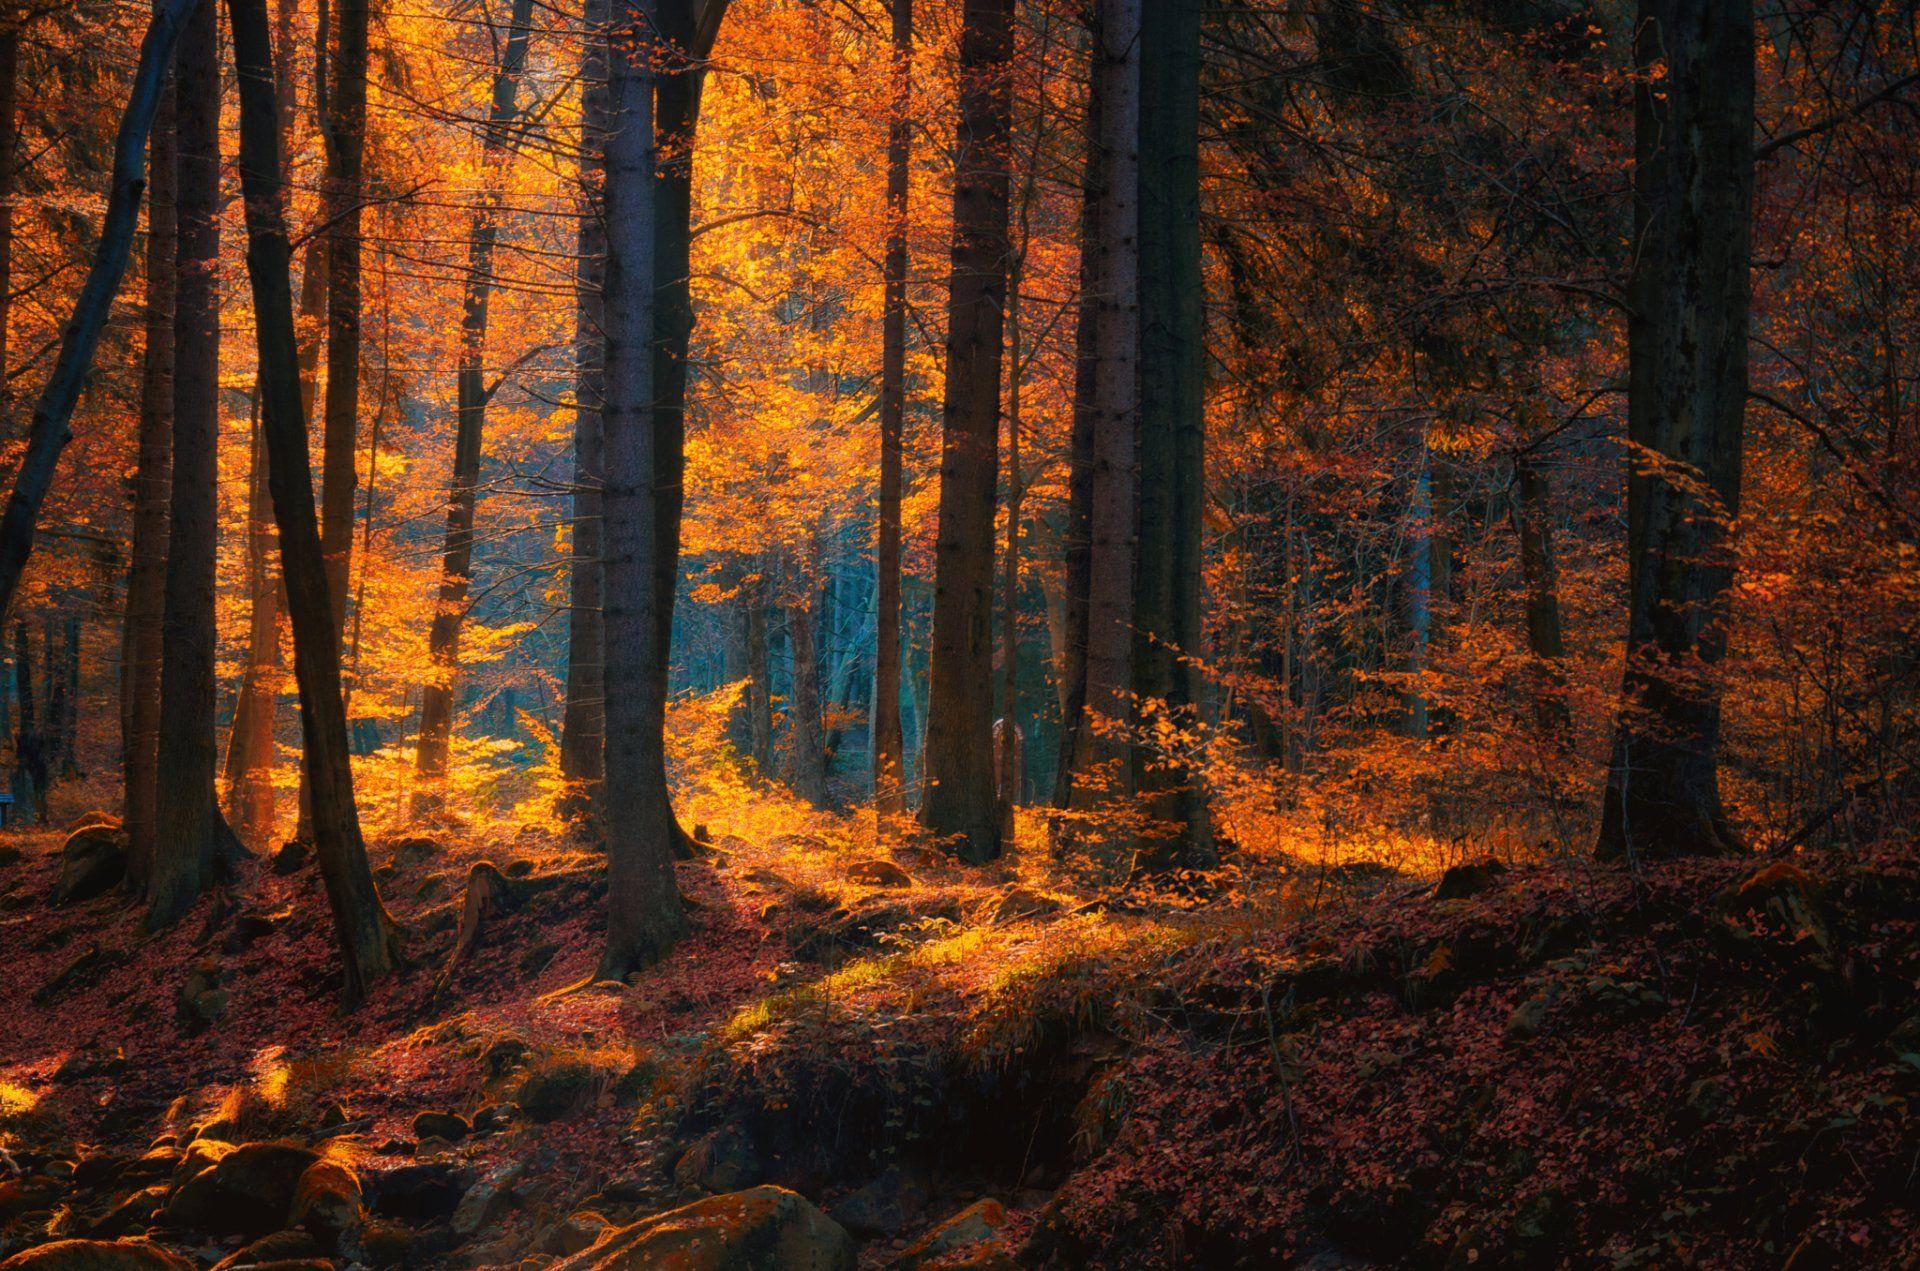 Autumn Forest Dark Wallpapers Wallpaper Cave